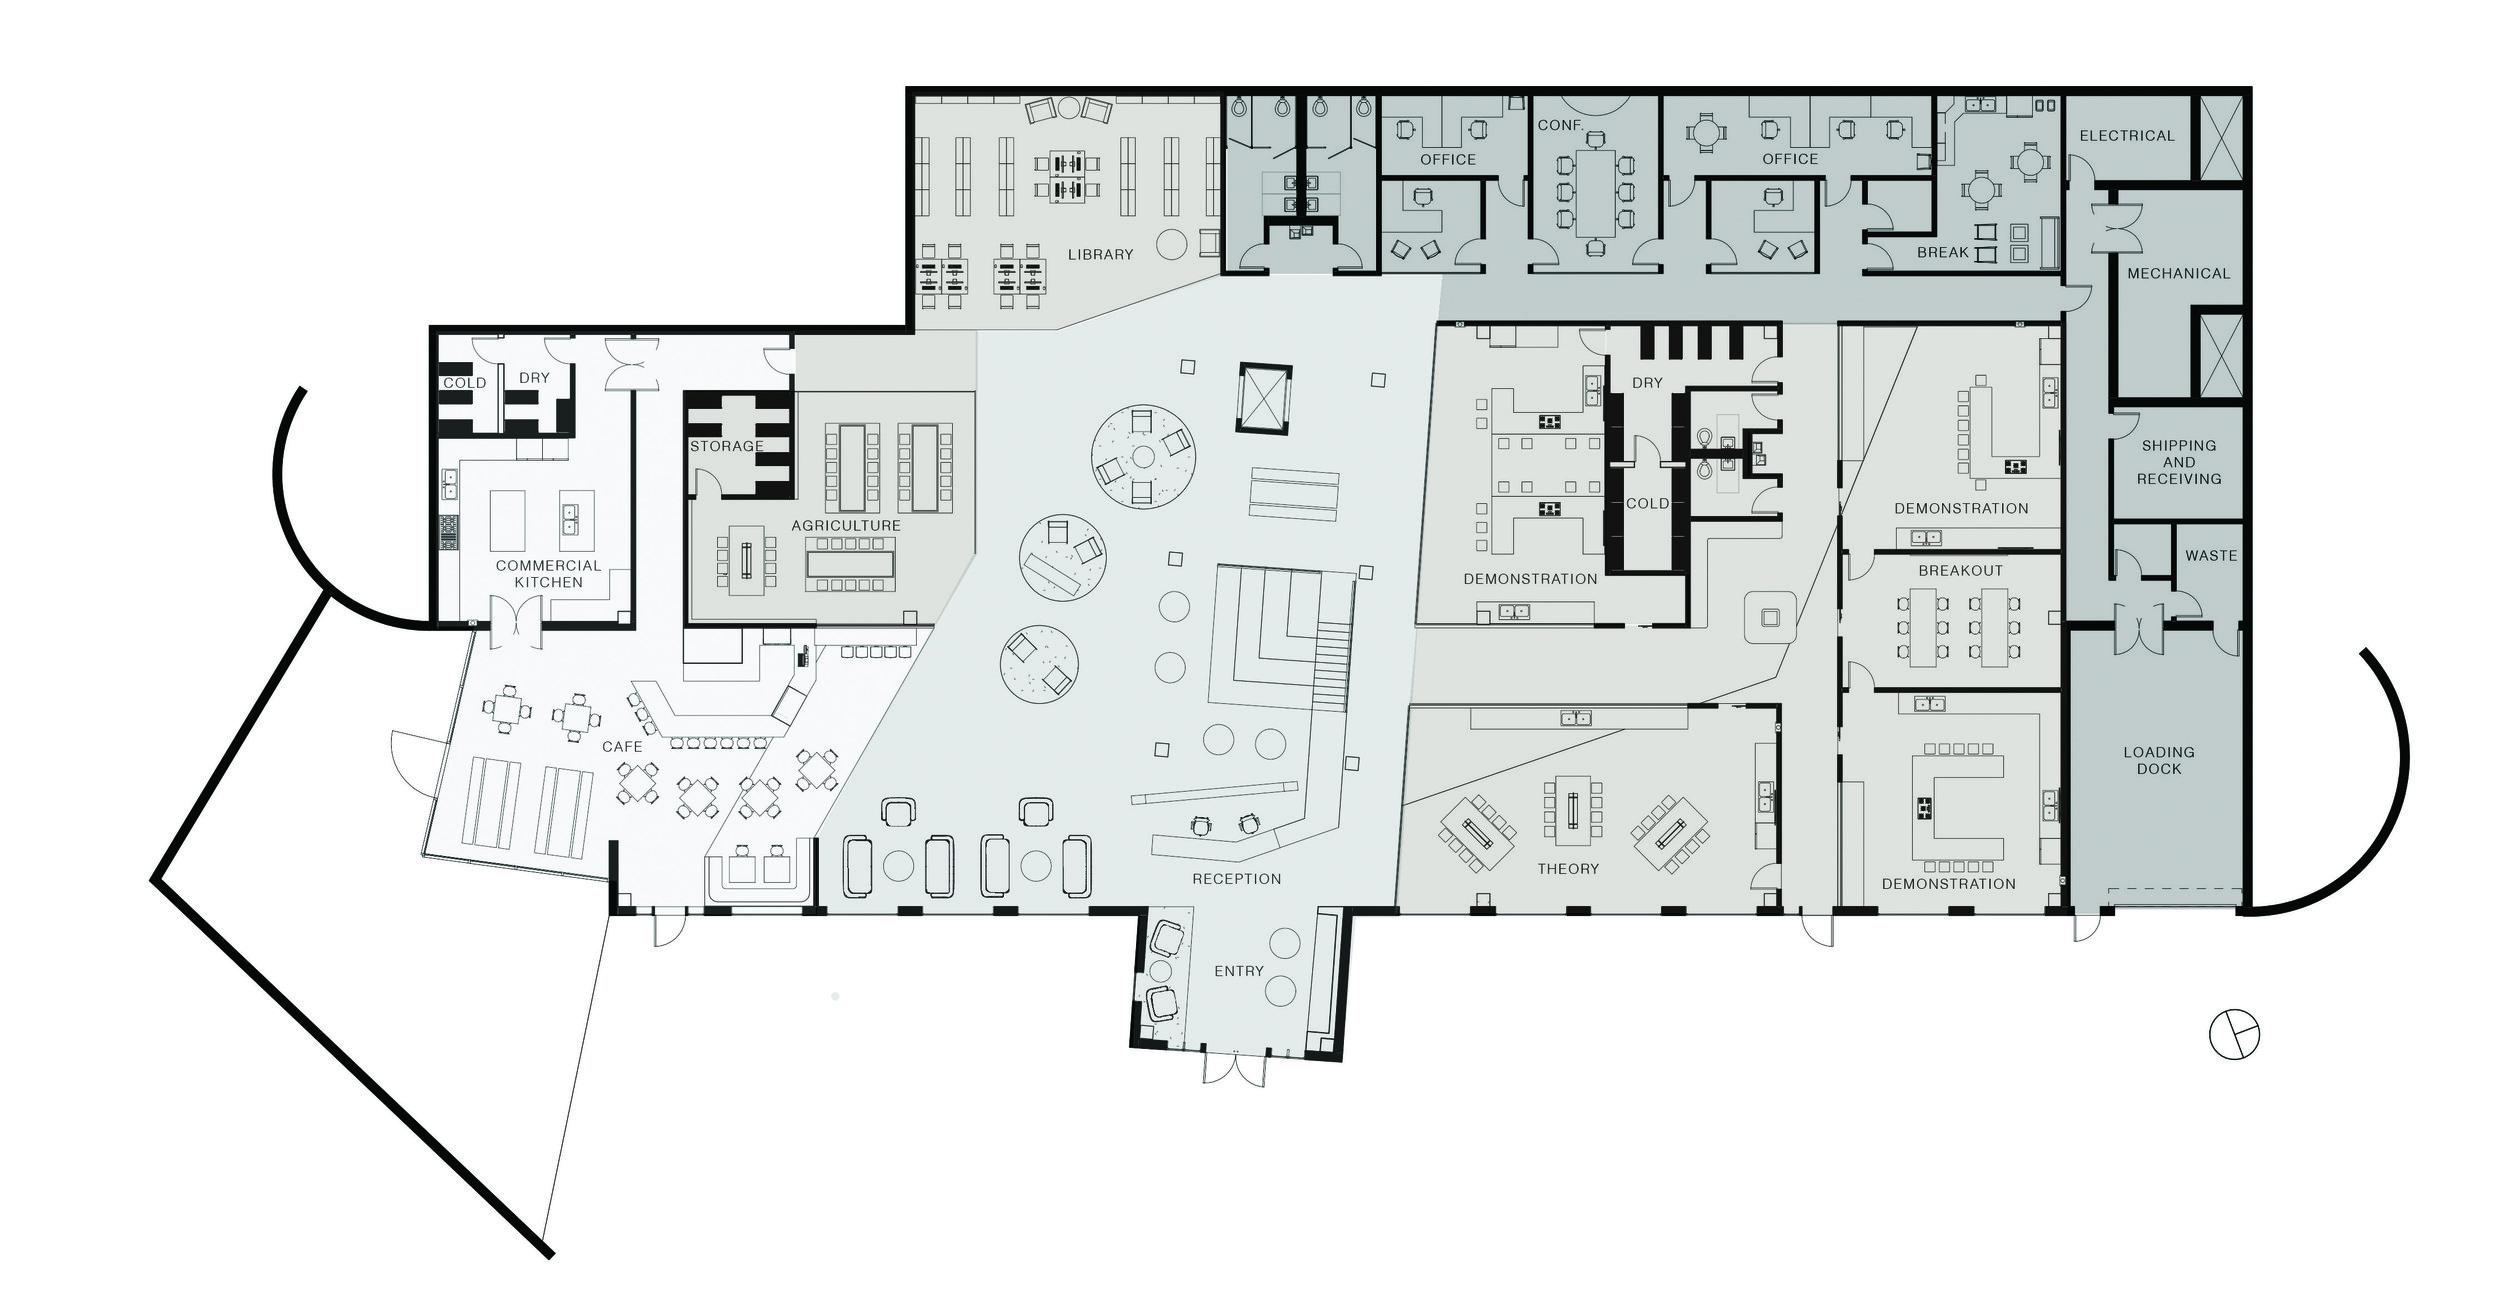 First floor plan, not to scale. ©2013 Caroline Ingalls